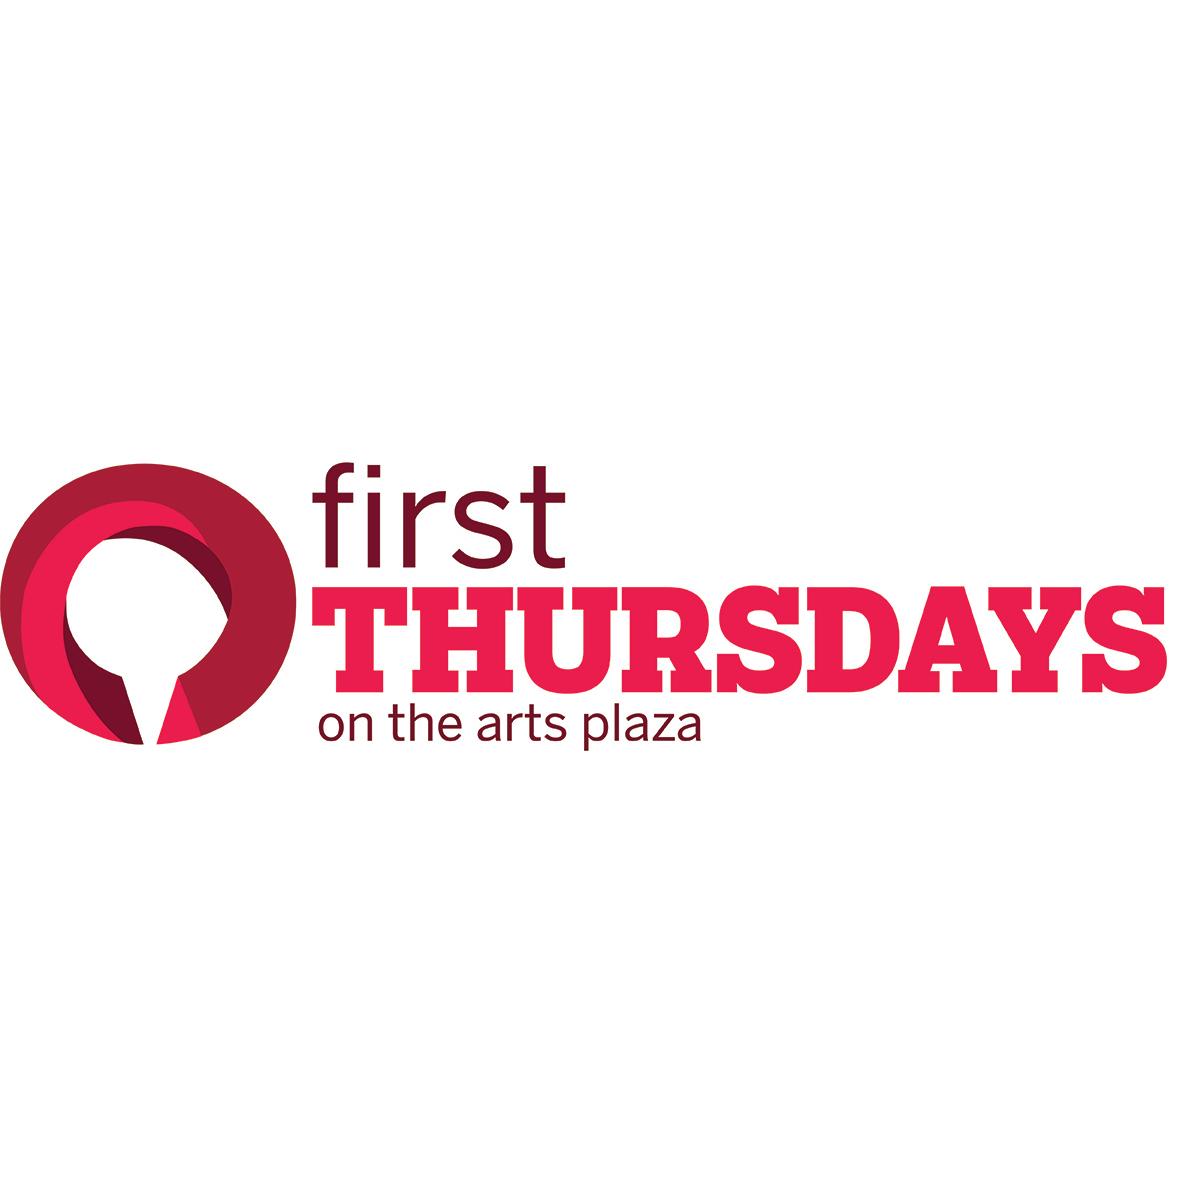 First Thursdays on the Arts Plaza